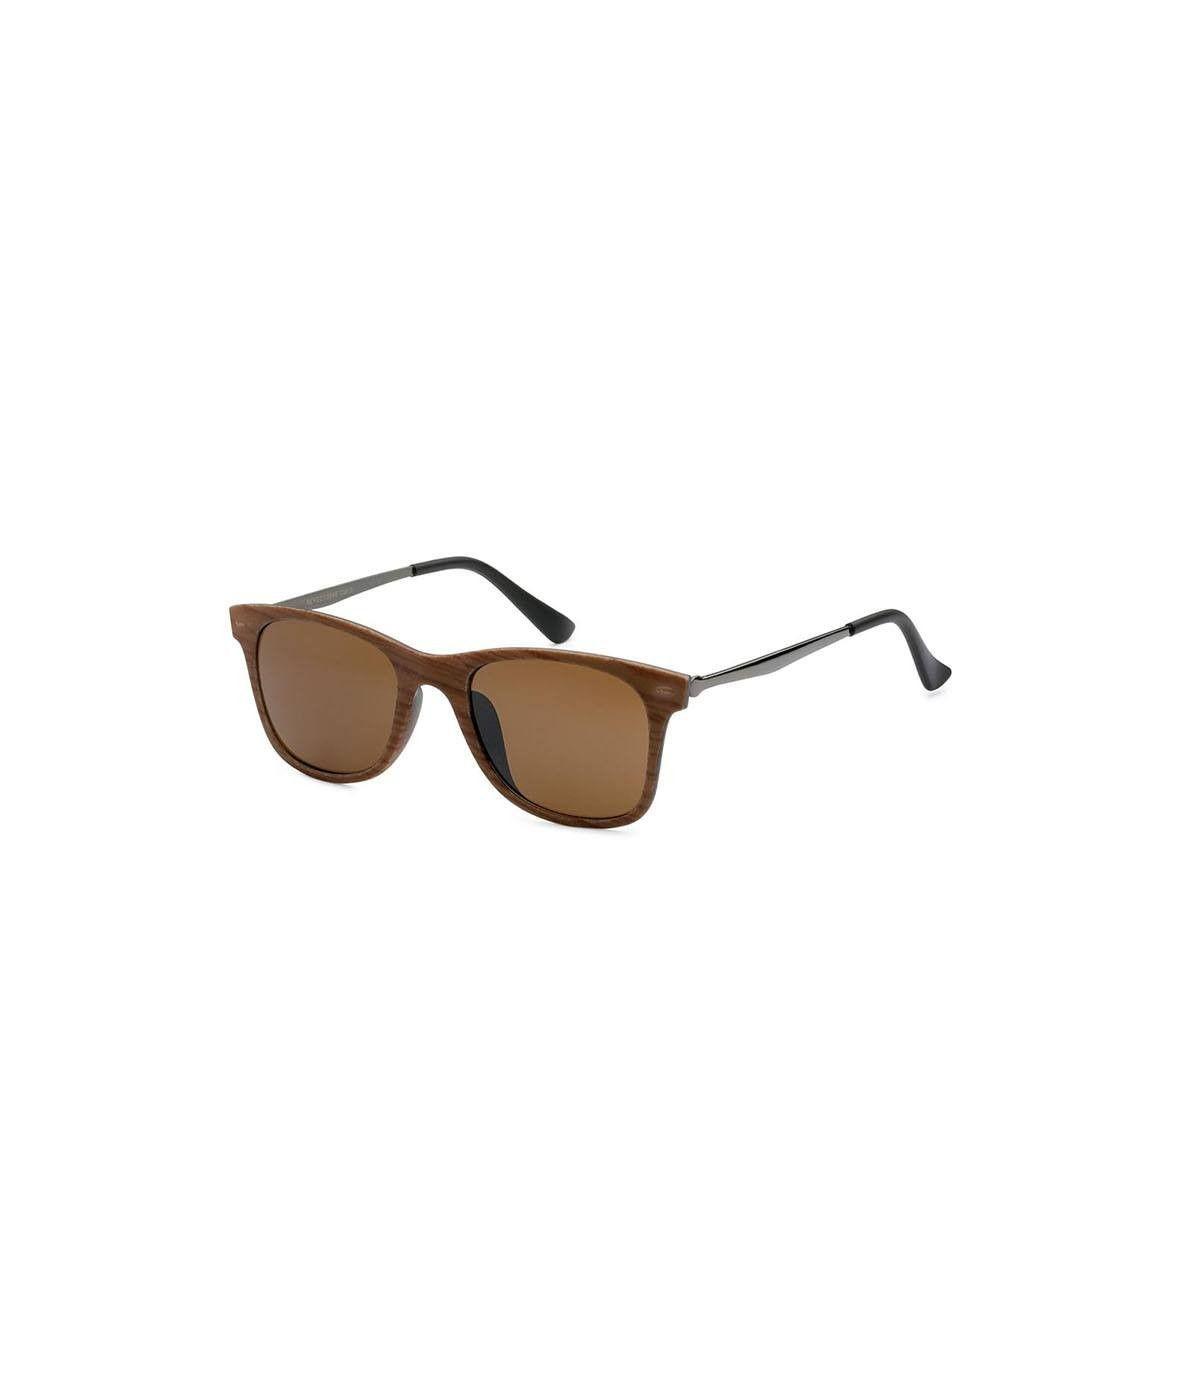 Wood Laminate Wayfarer Sunglasses, Lifetime Guarantee   Products ... c948dd59e67c